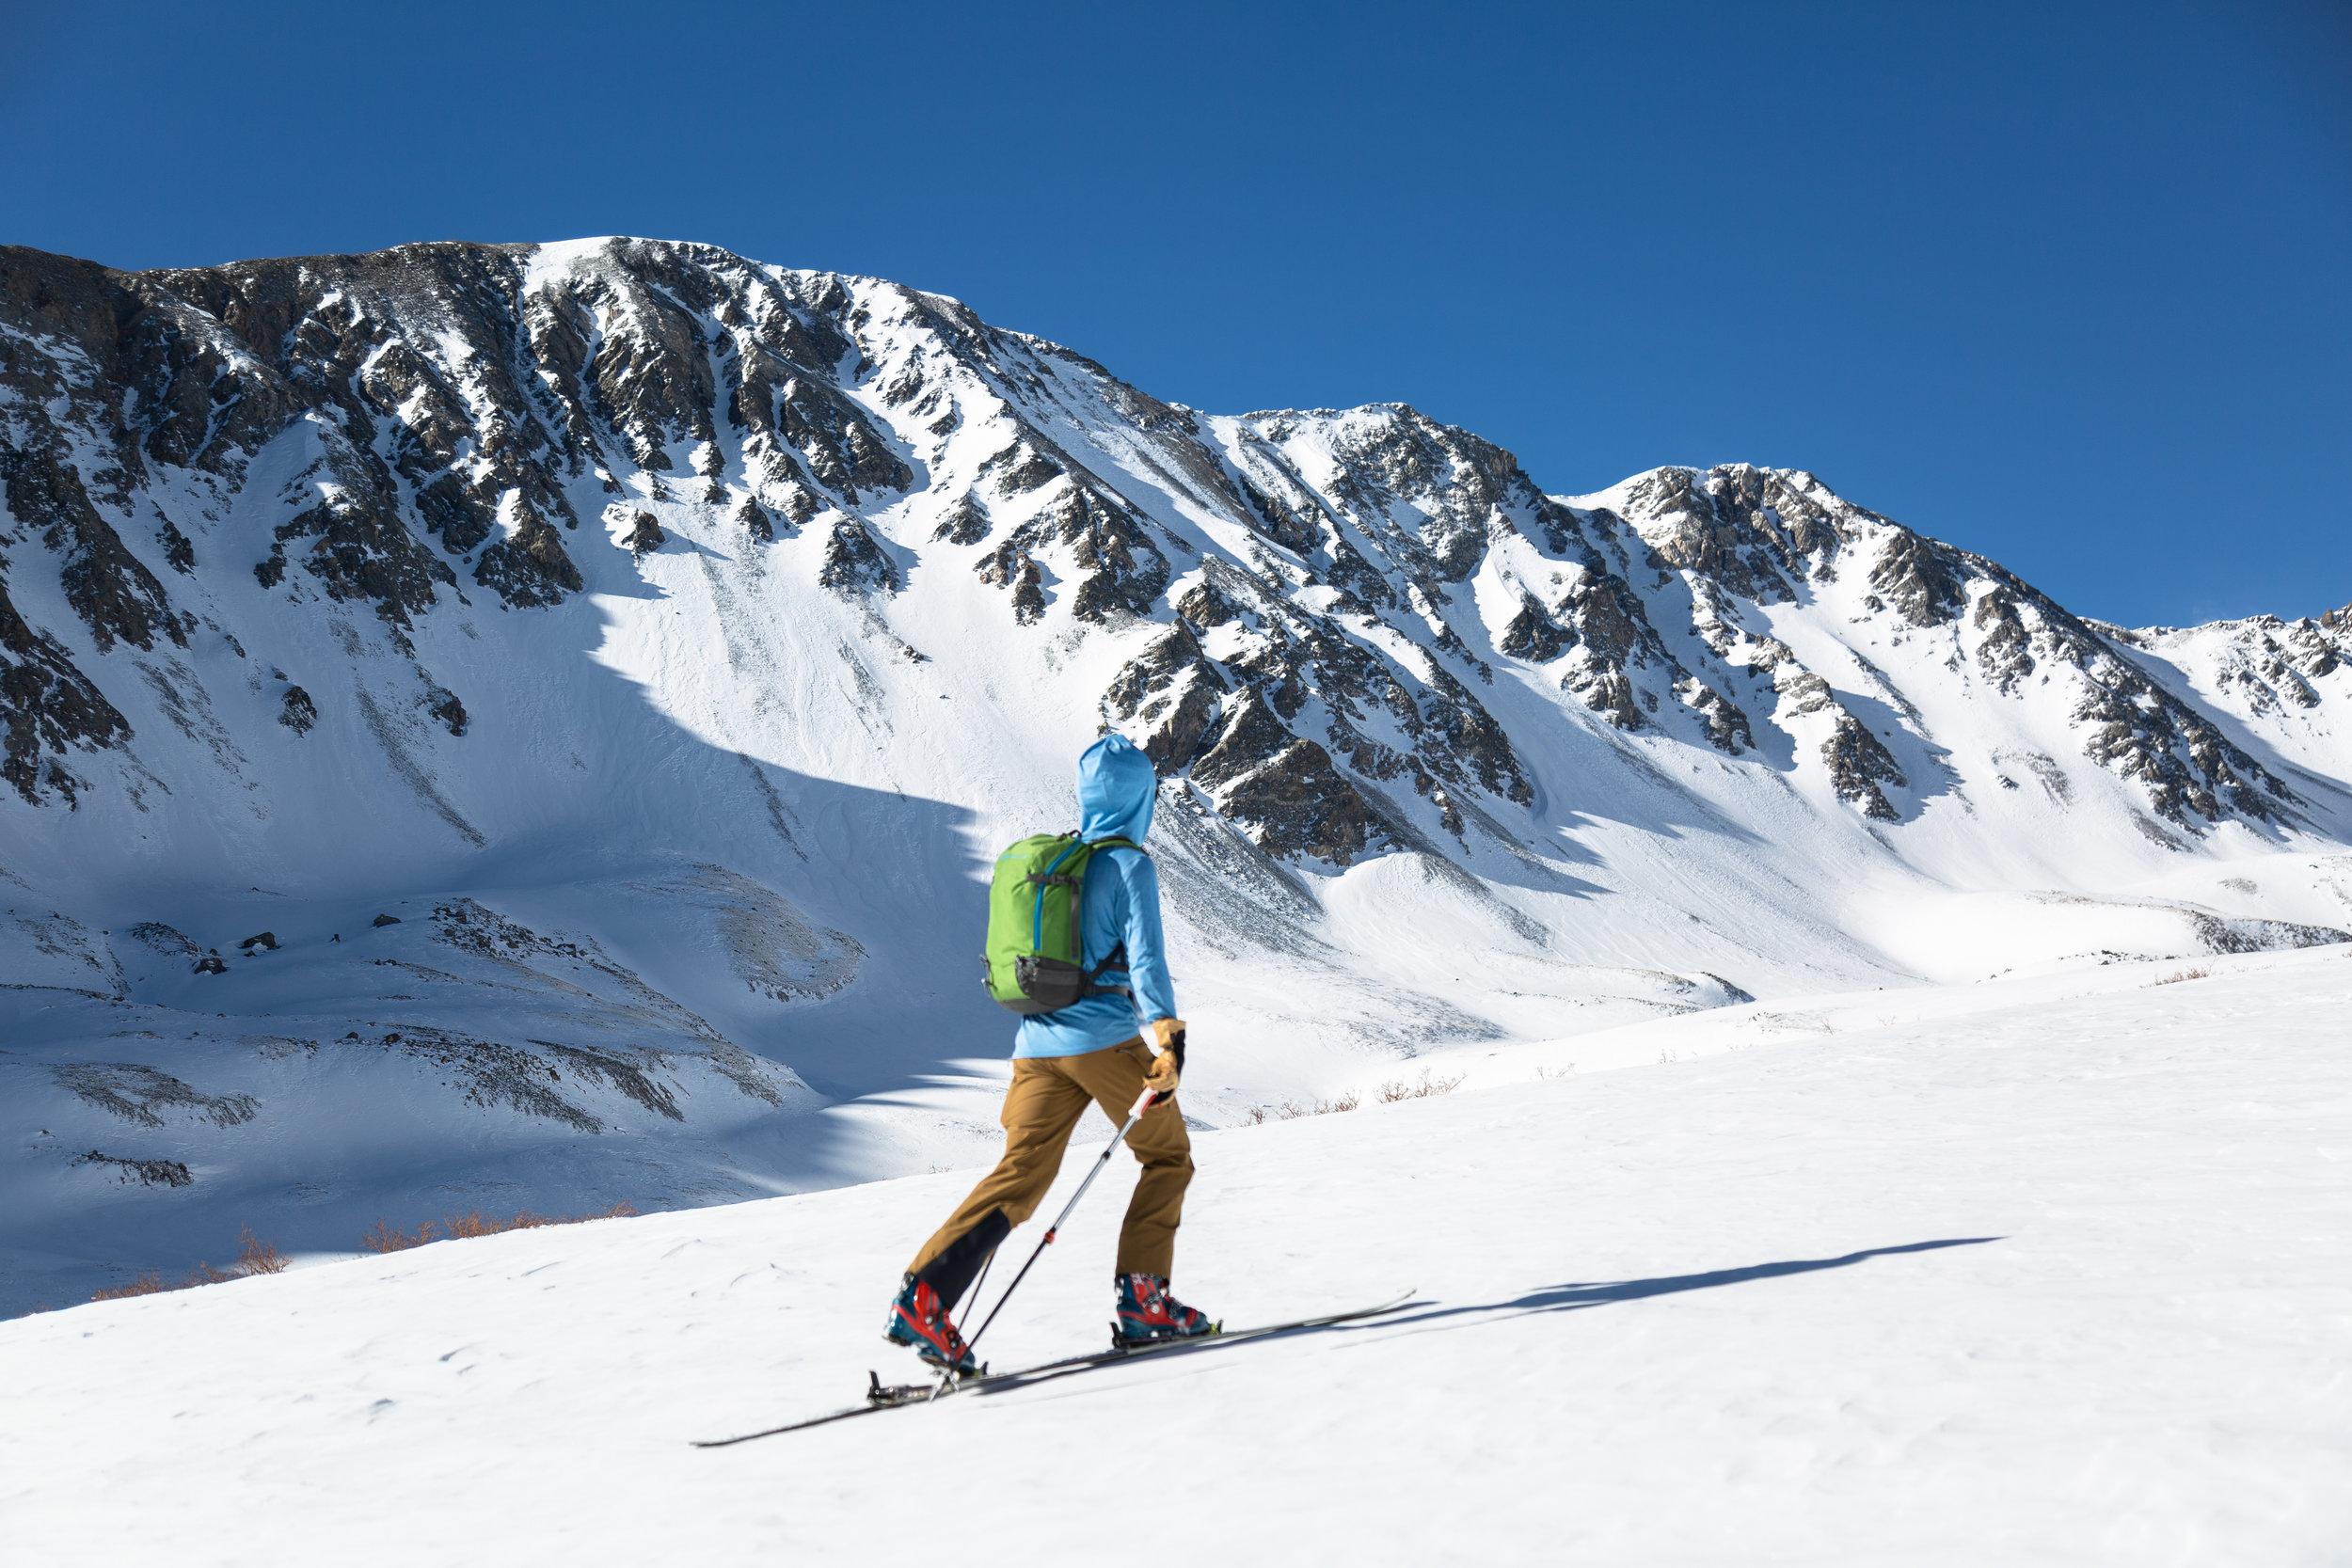 JTG_Skiing-3.jpg